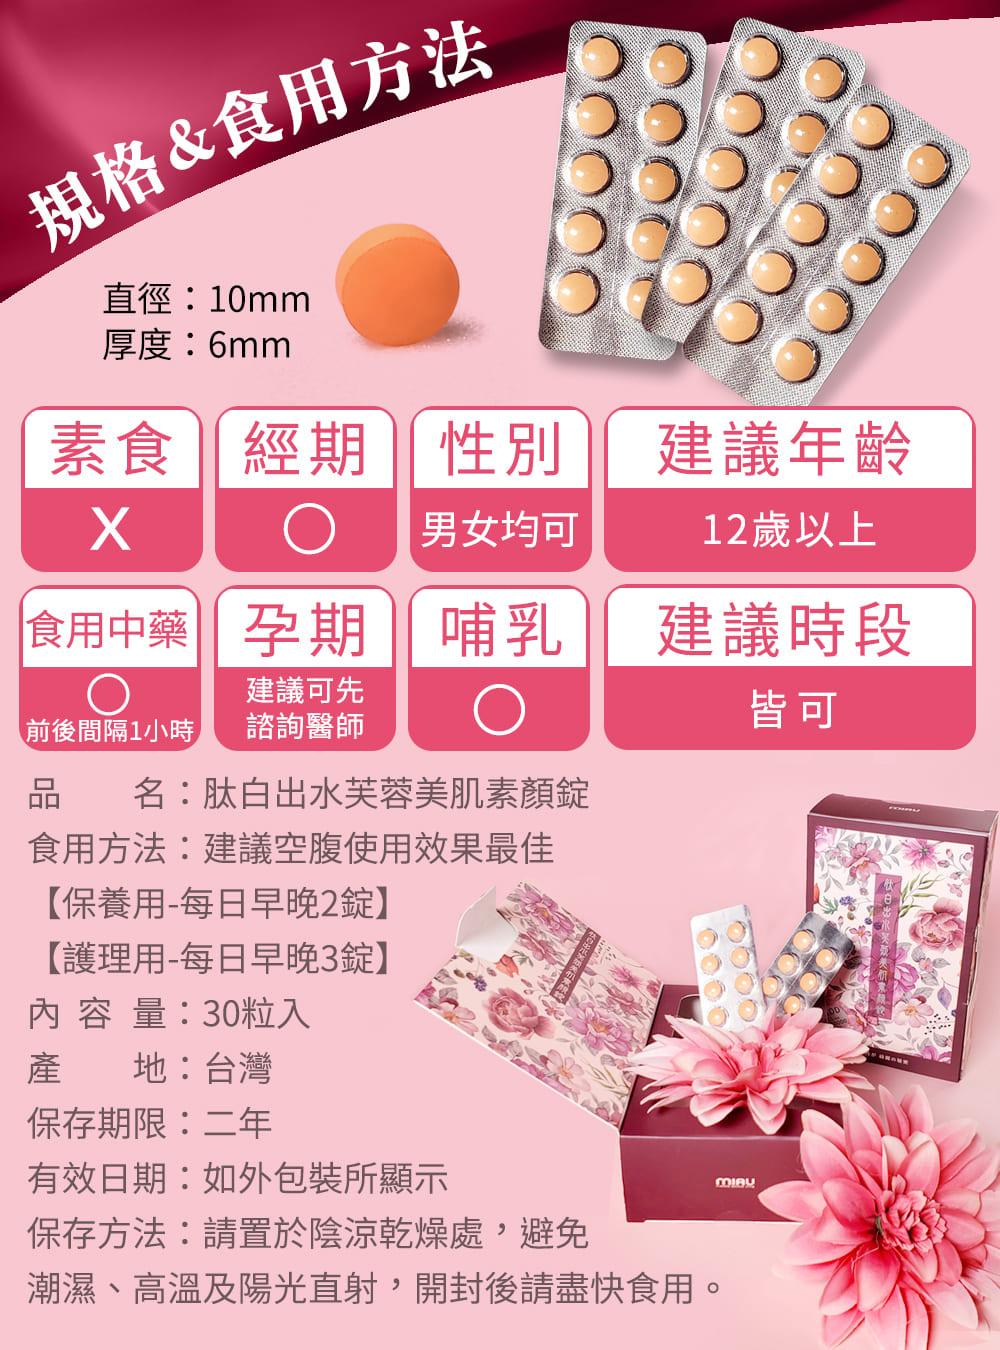 MIAU肽白美肌素顏錠